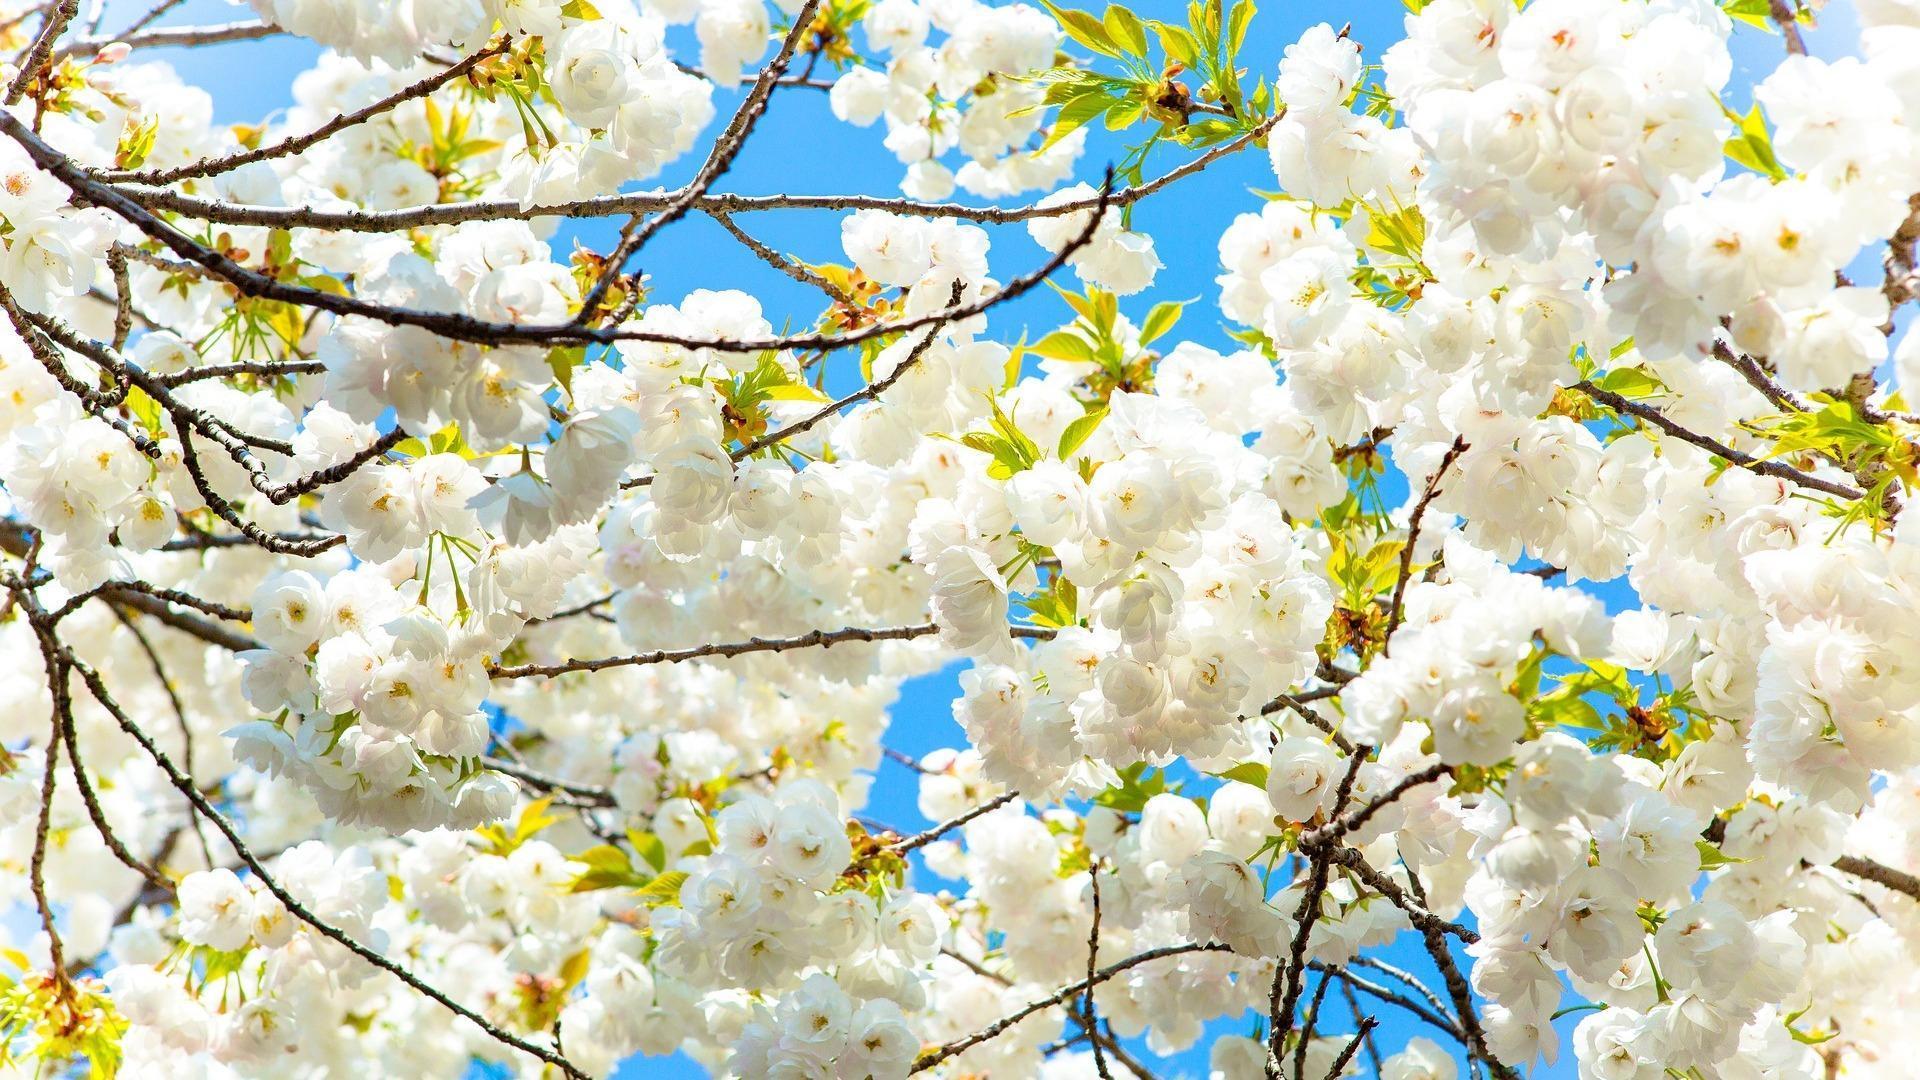 Live Wallpaper Spring Hd 4k Naturaleza Fotos Flor For